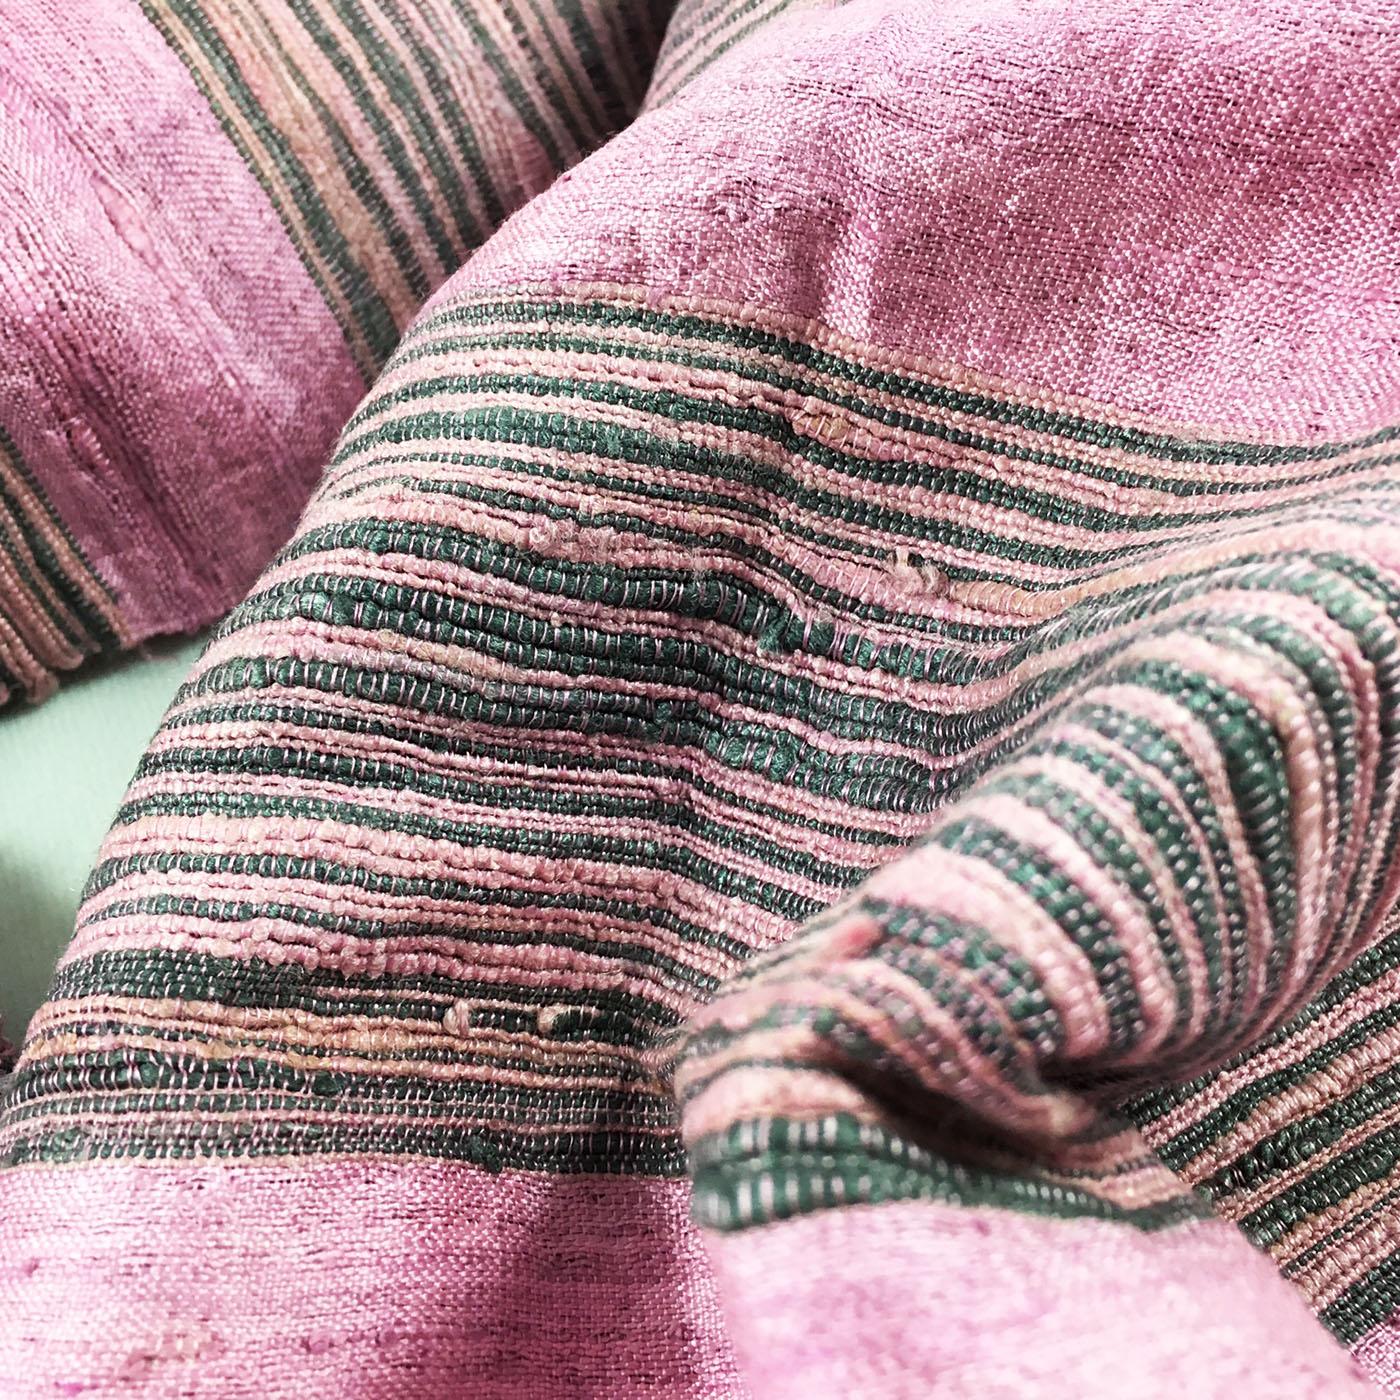 silk scarf from Thailand